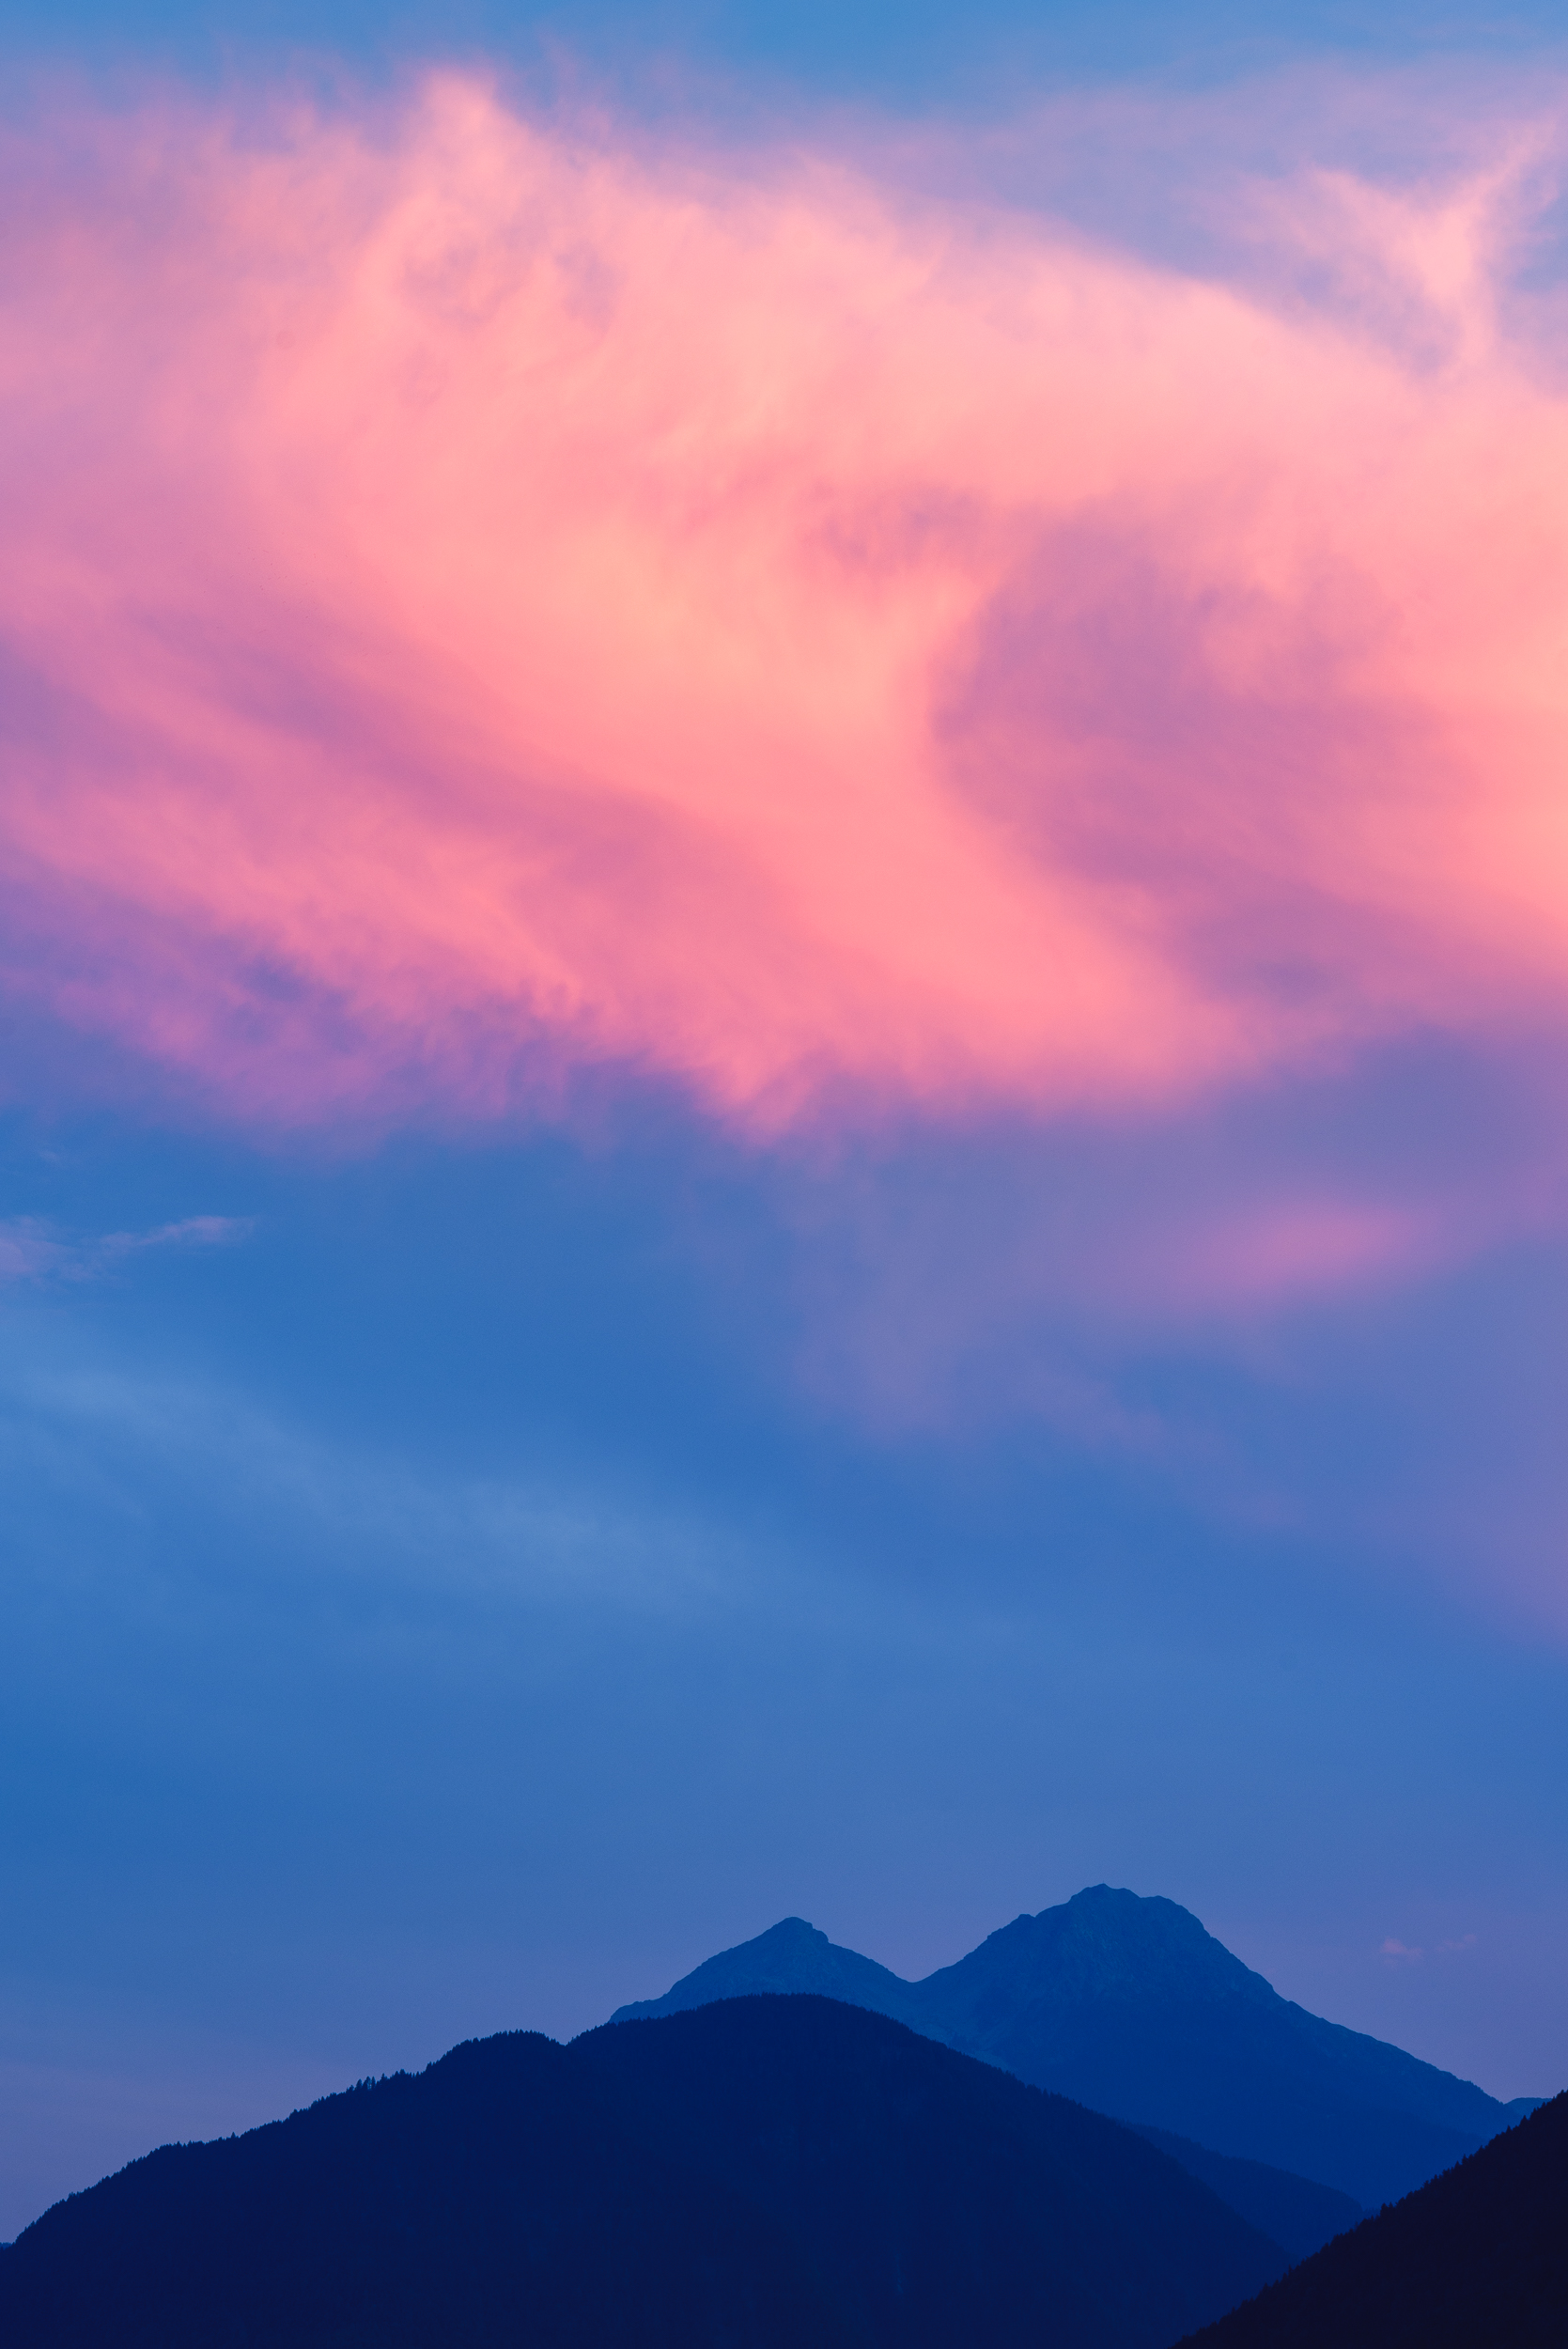 2018-07-30_Web_4753_Golden sunset over the mountains.jpg